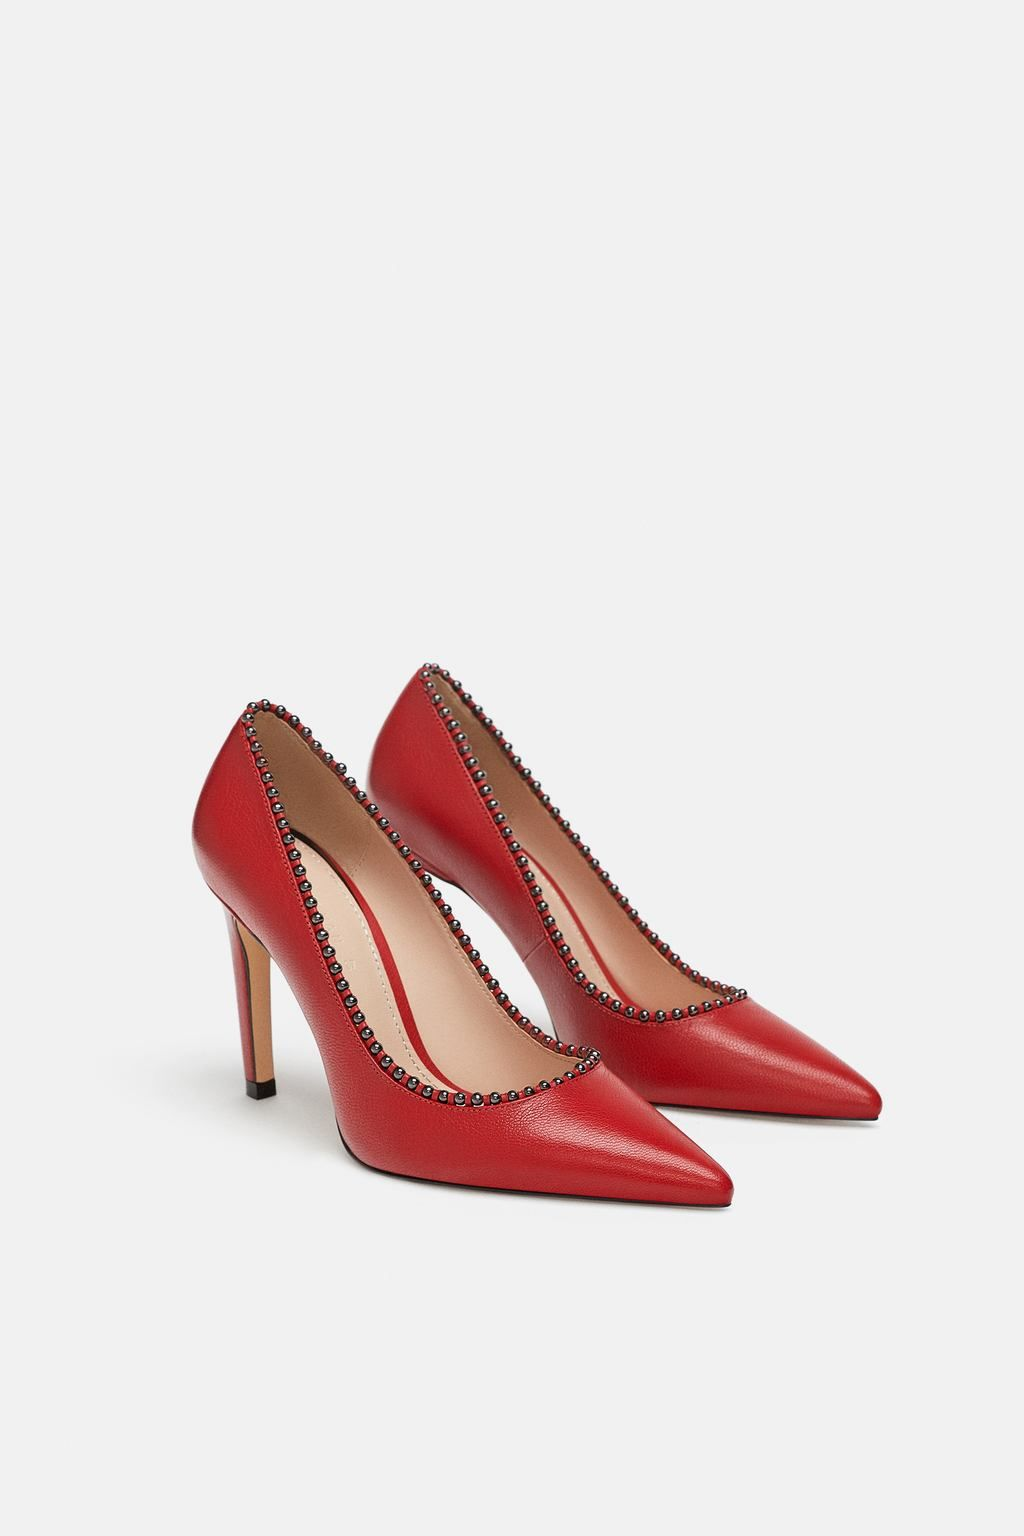 5fde46fa ZARA - SALÓN PIEL BOLITAS   Total Look Denim   Shoes, Leather pumps ...